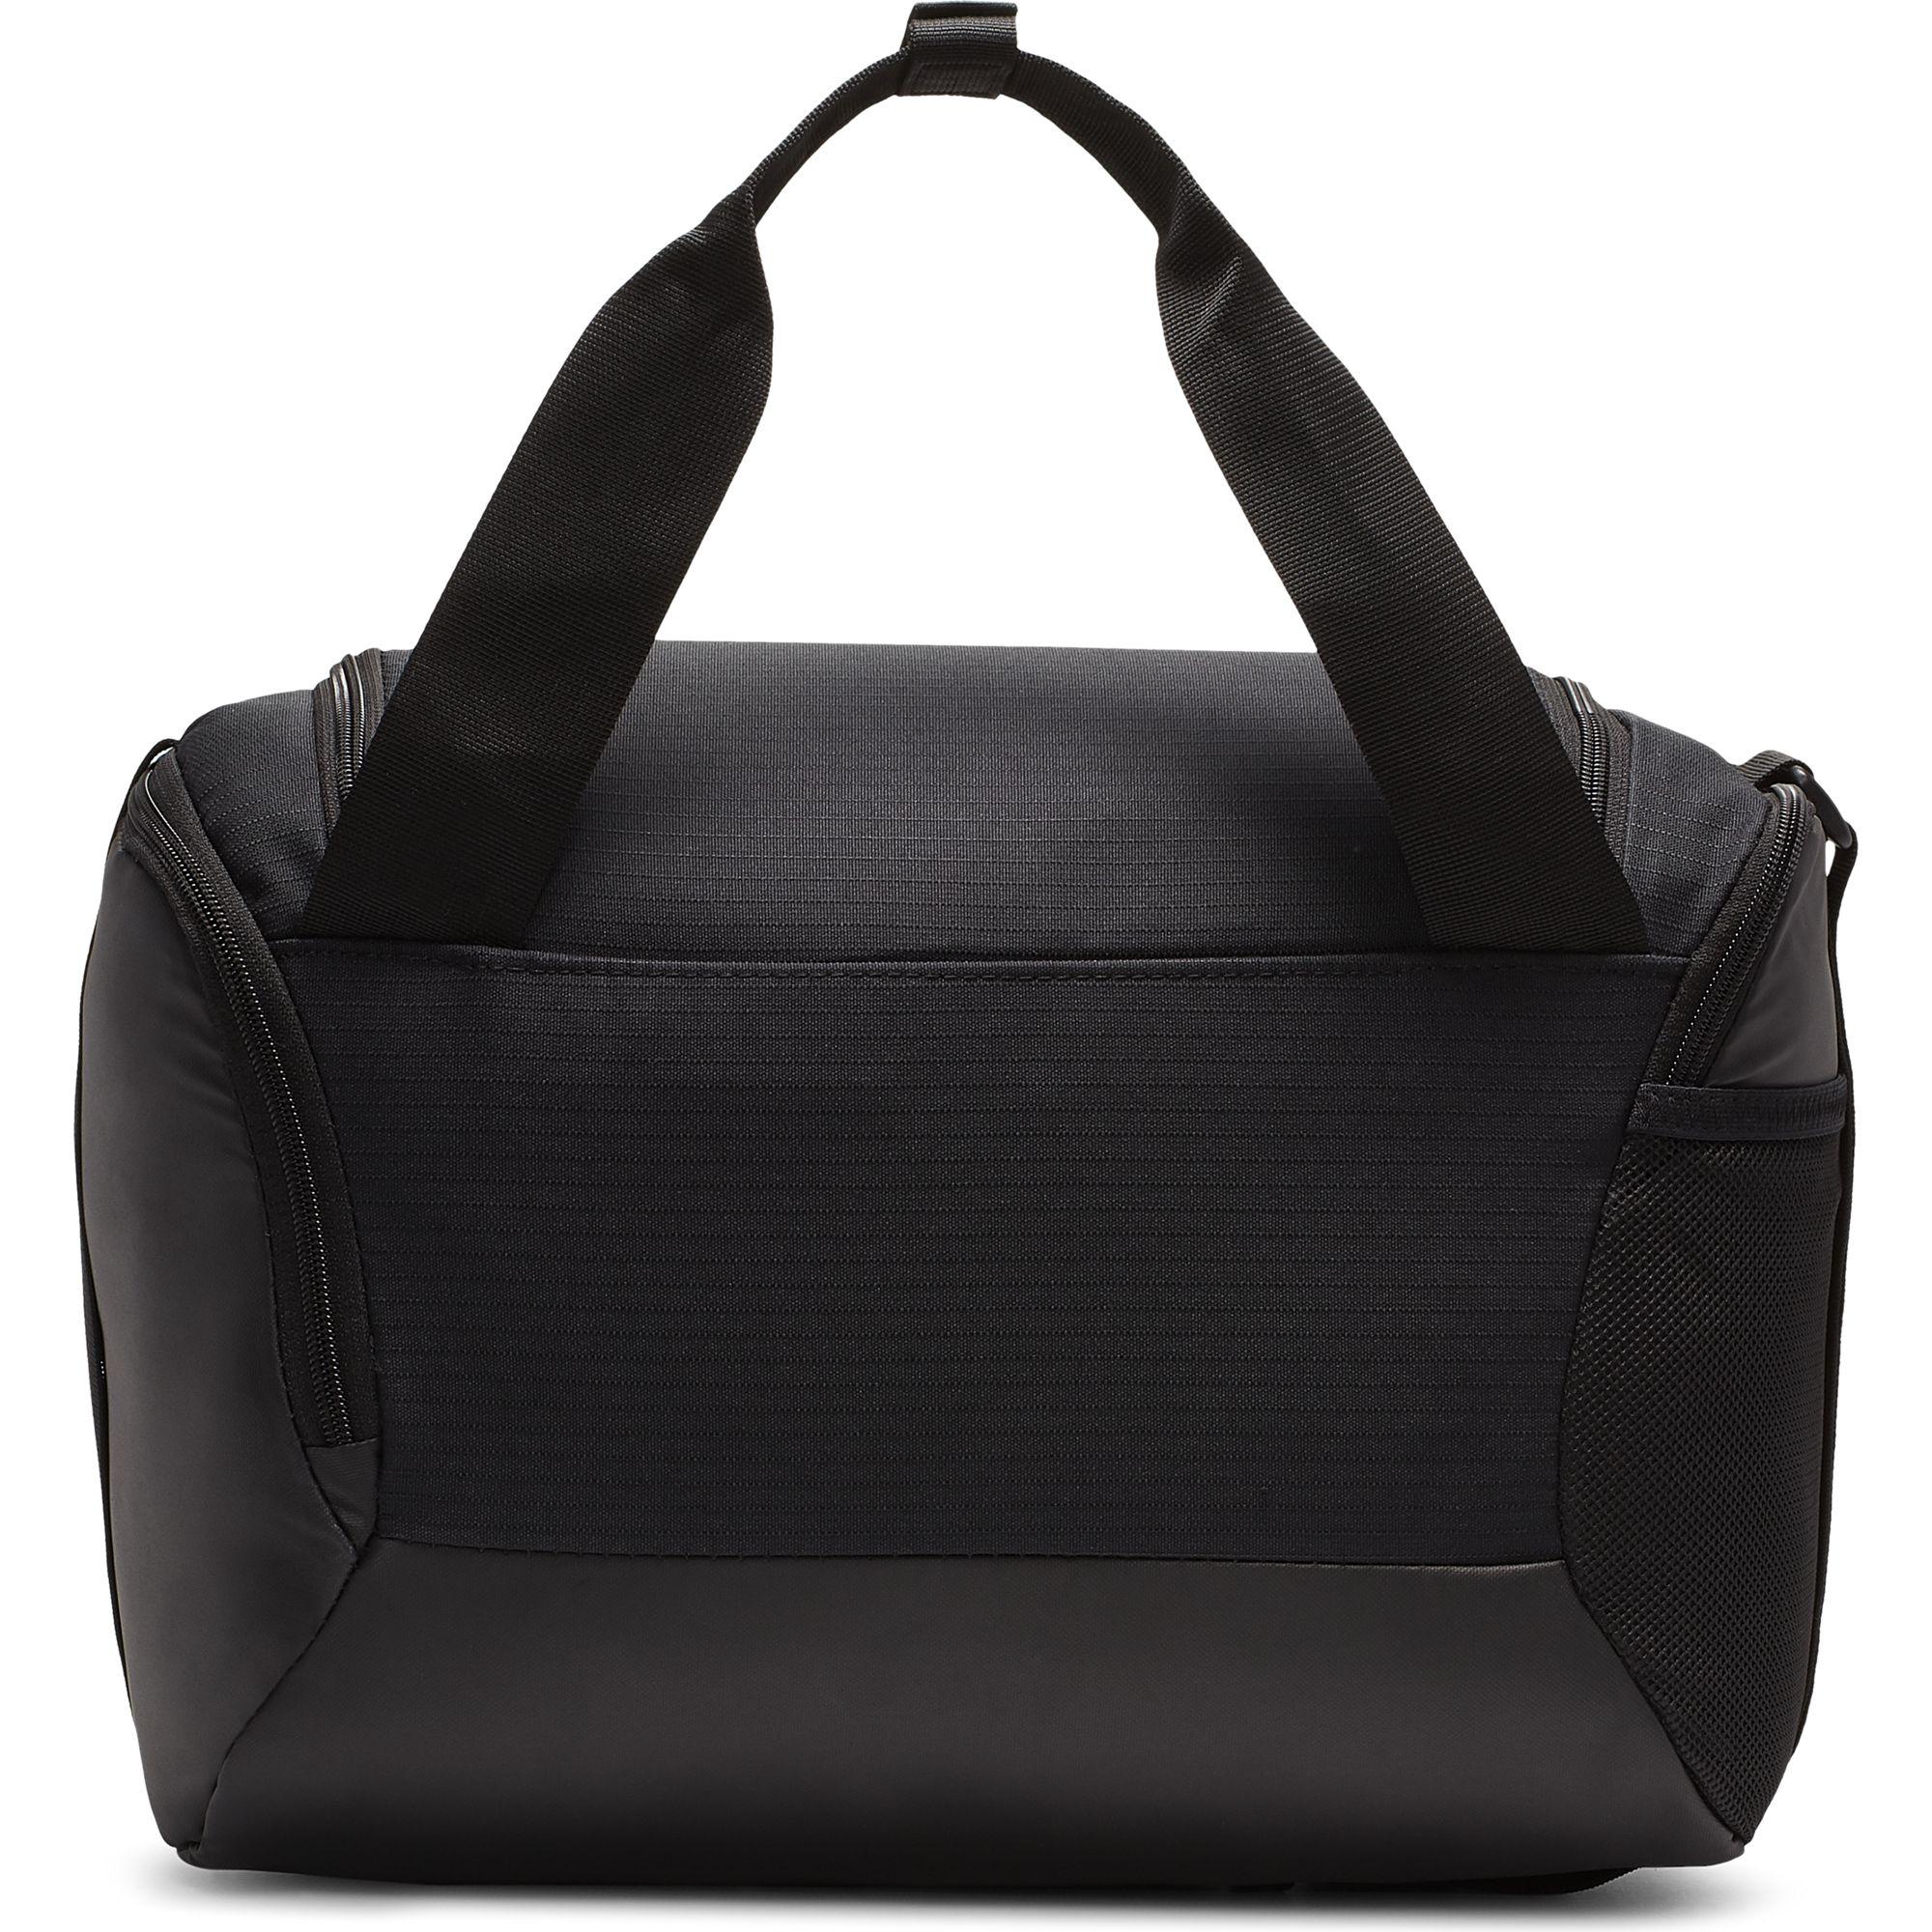 Brasilia X-Small Duffel Bag, Black/Black, swatch